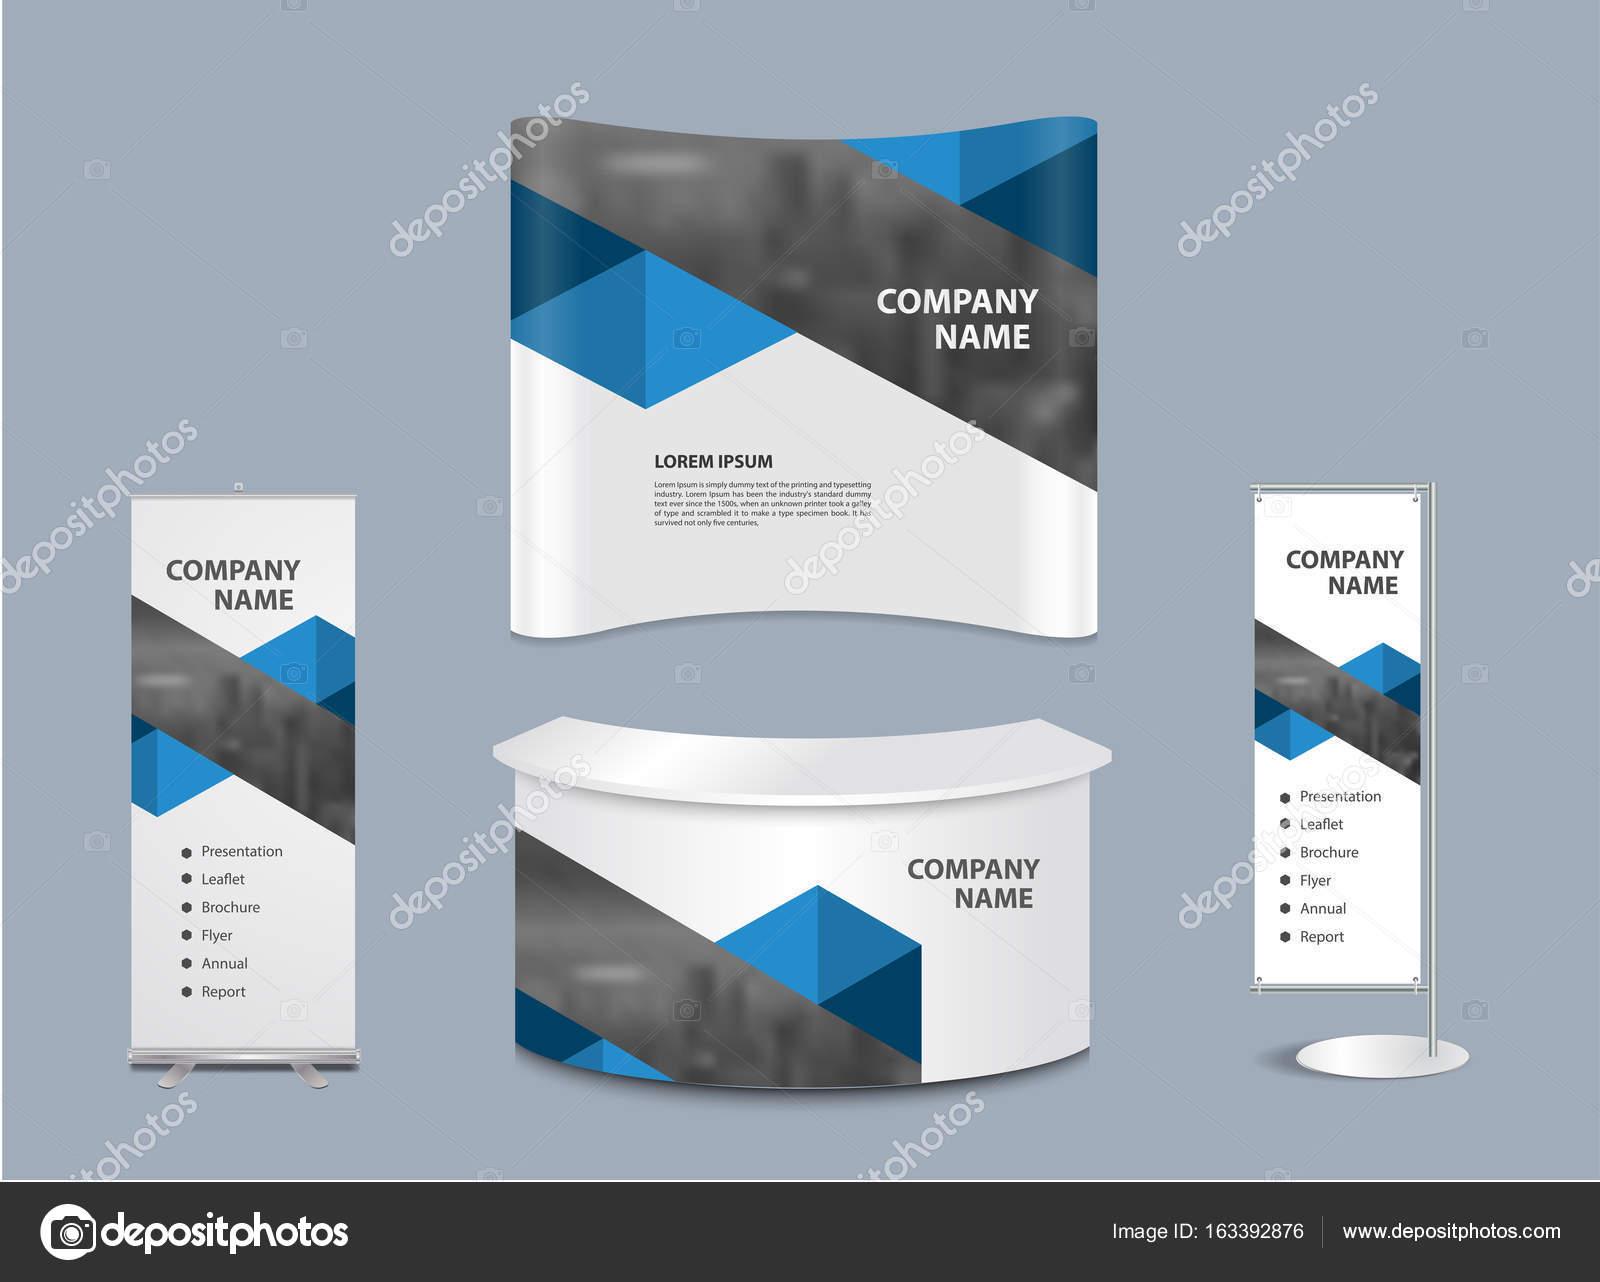 Exhibition Stand Design Illustrator : Advertising exhibition stand design — stock vector